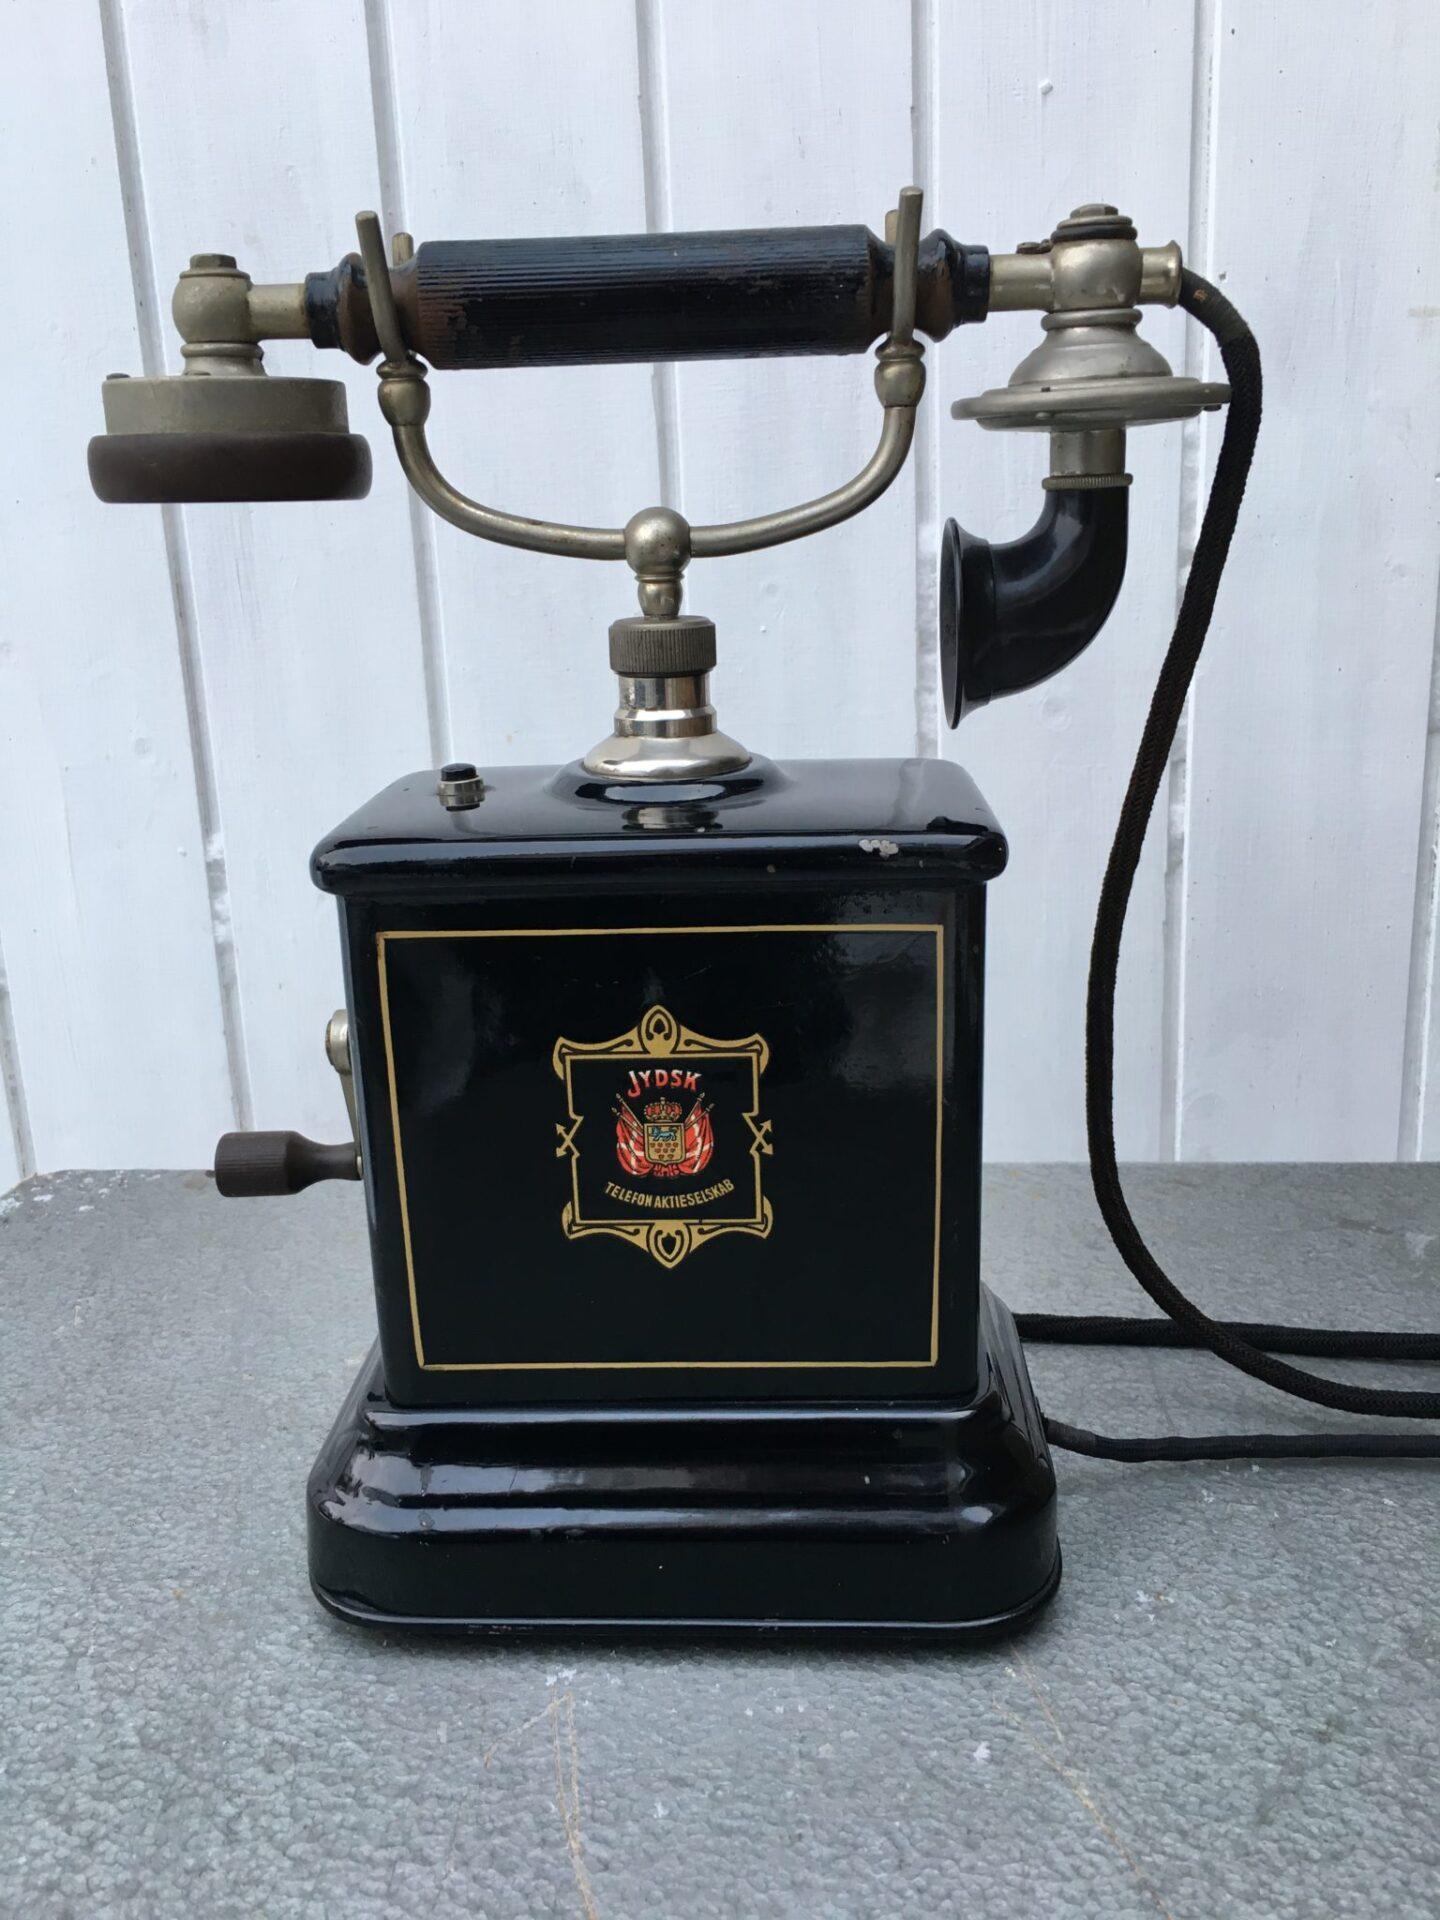 Bordtelefon, Jydsk Telefonaktieselskab, ca 1930, pris 700 kr